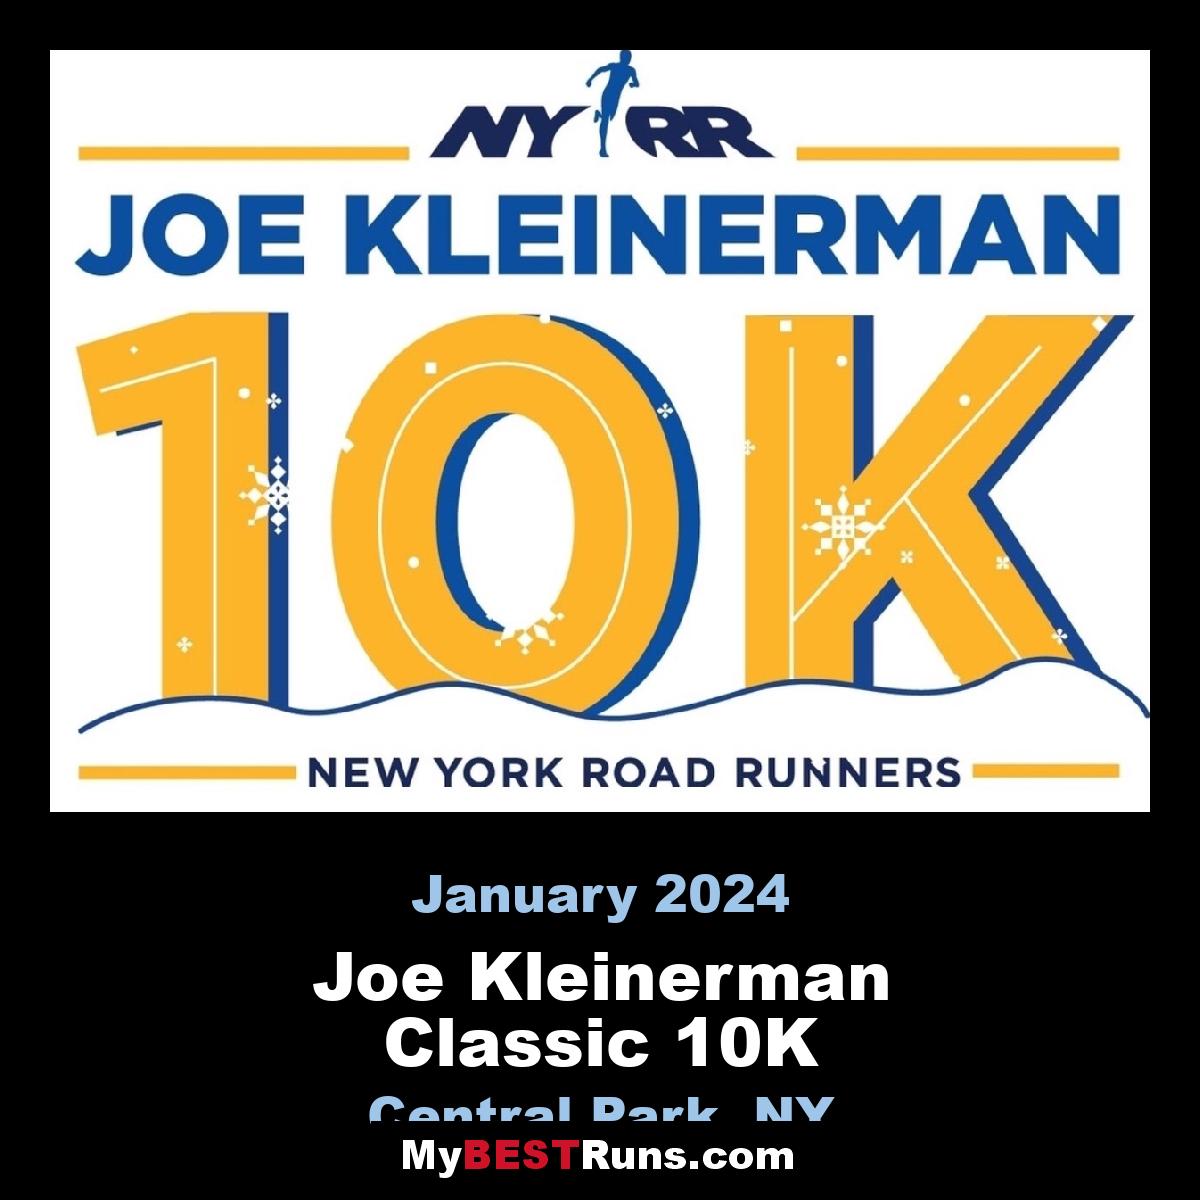 Joe Kleinerman Classic 10K